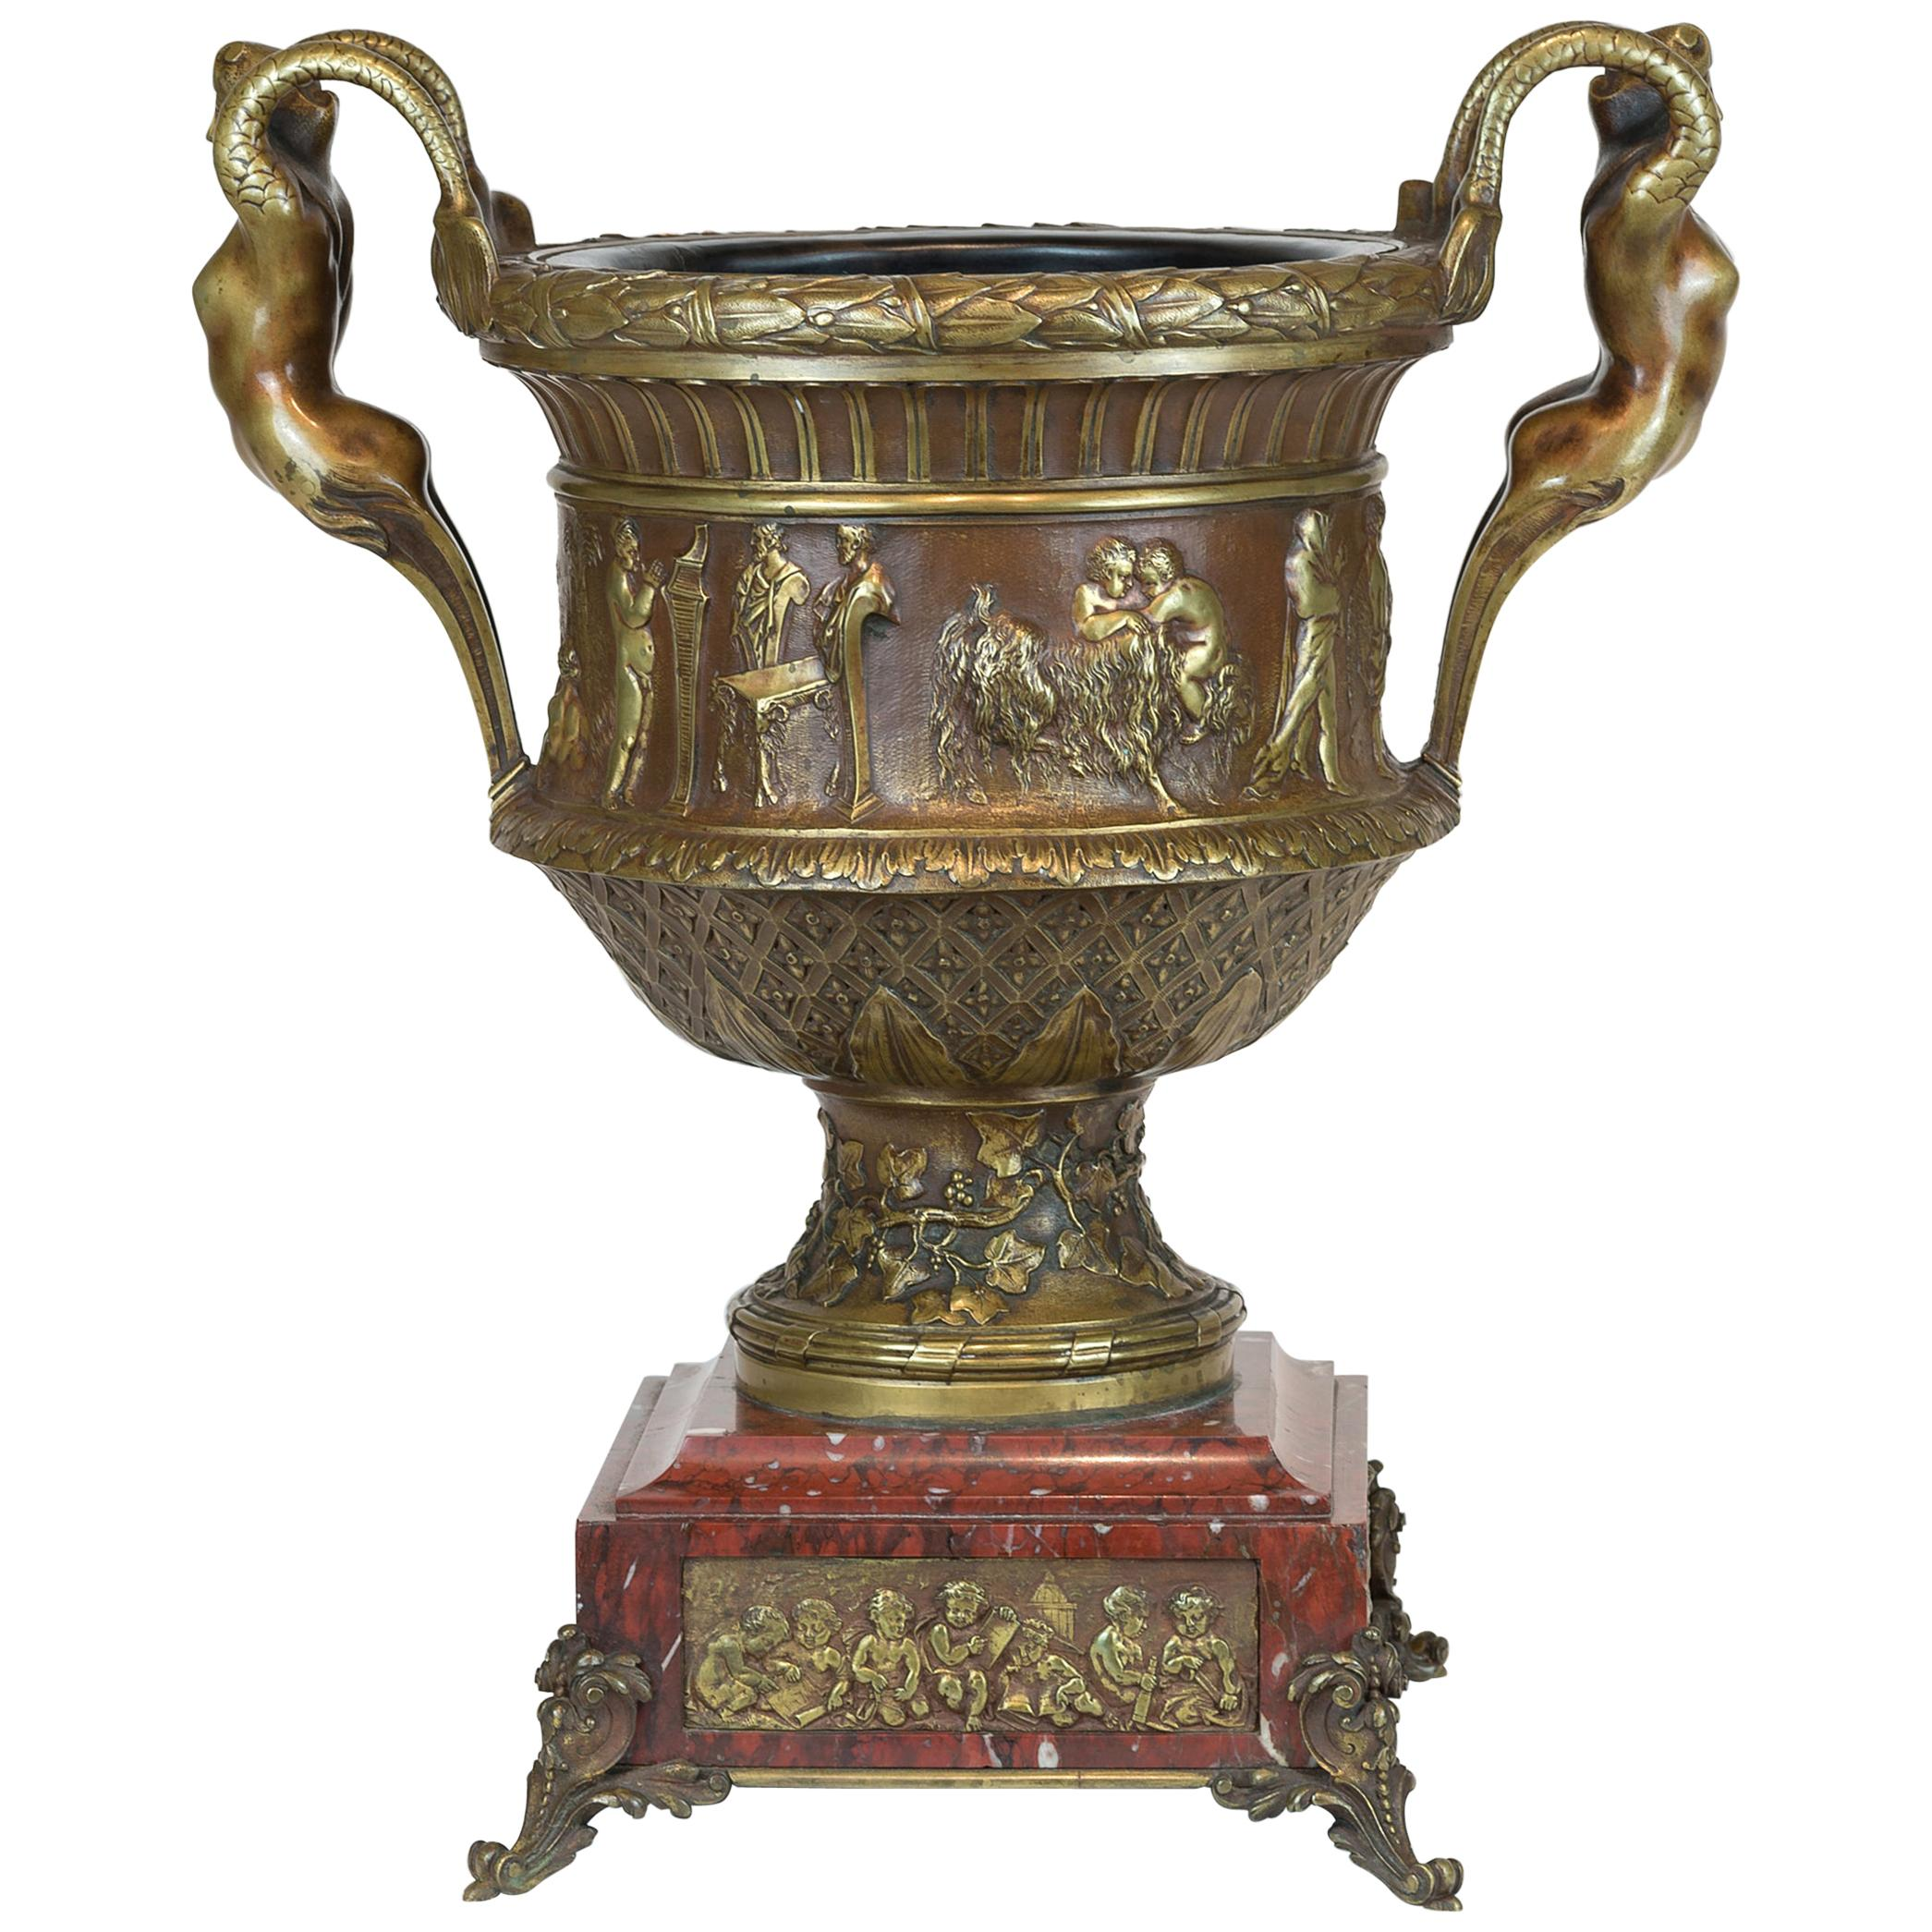 Renaissance Style Bronze Centrepiece Vase with Mermaid Handles